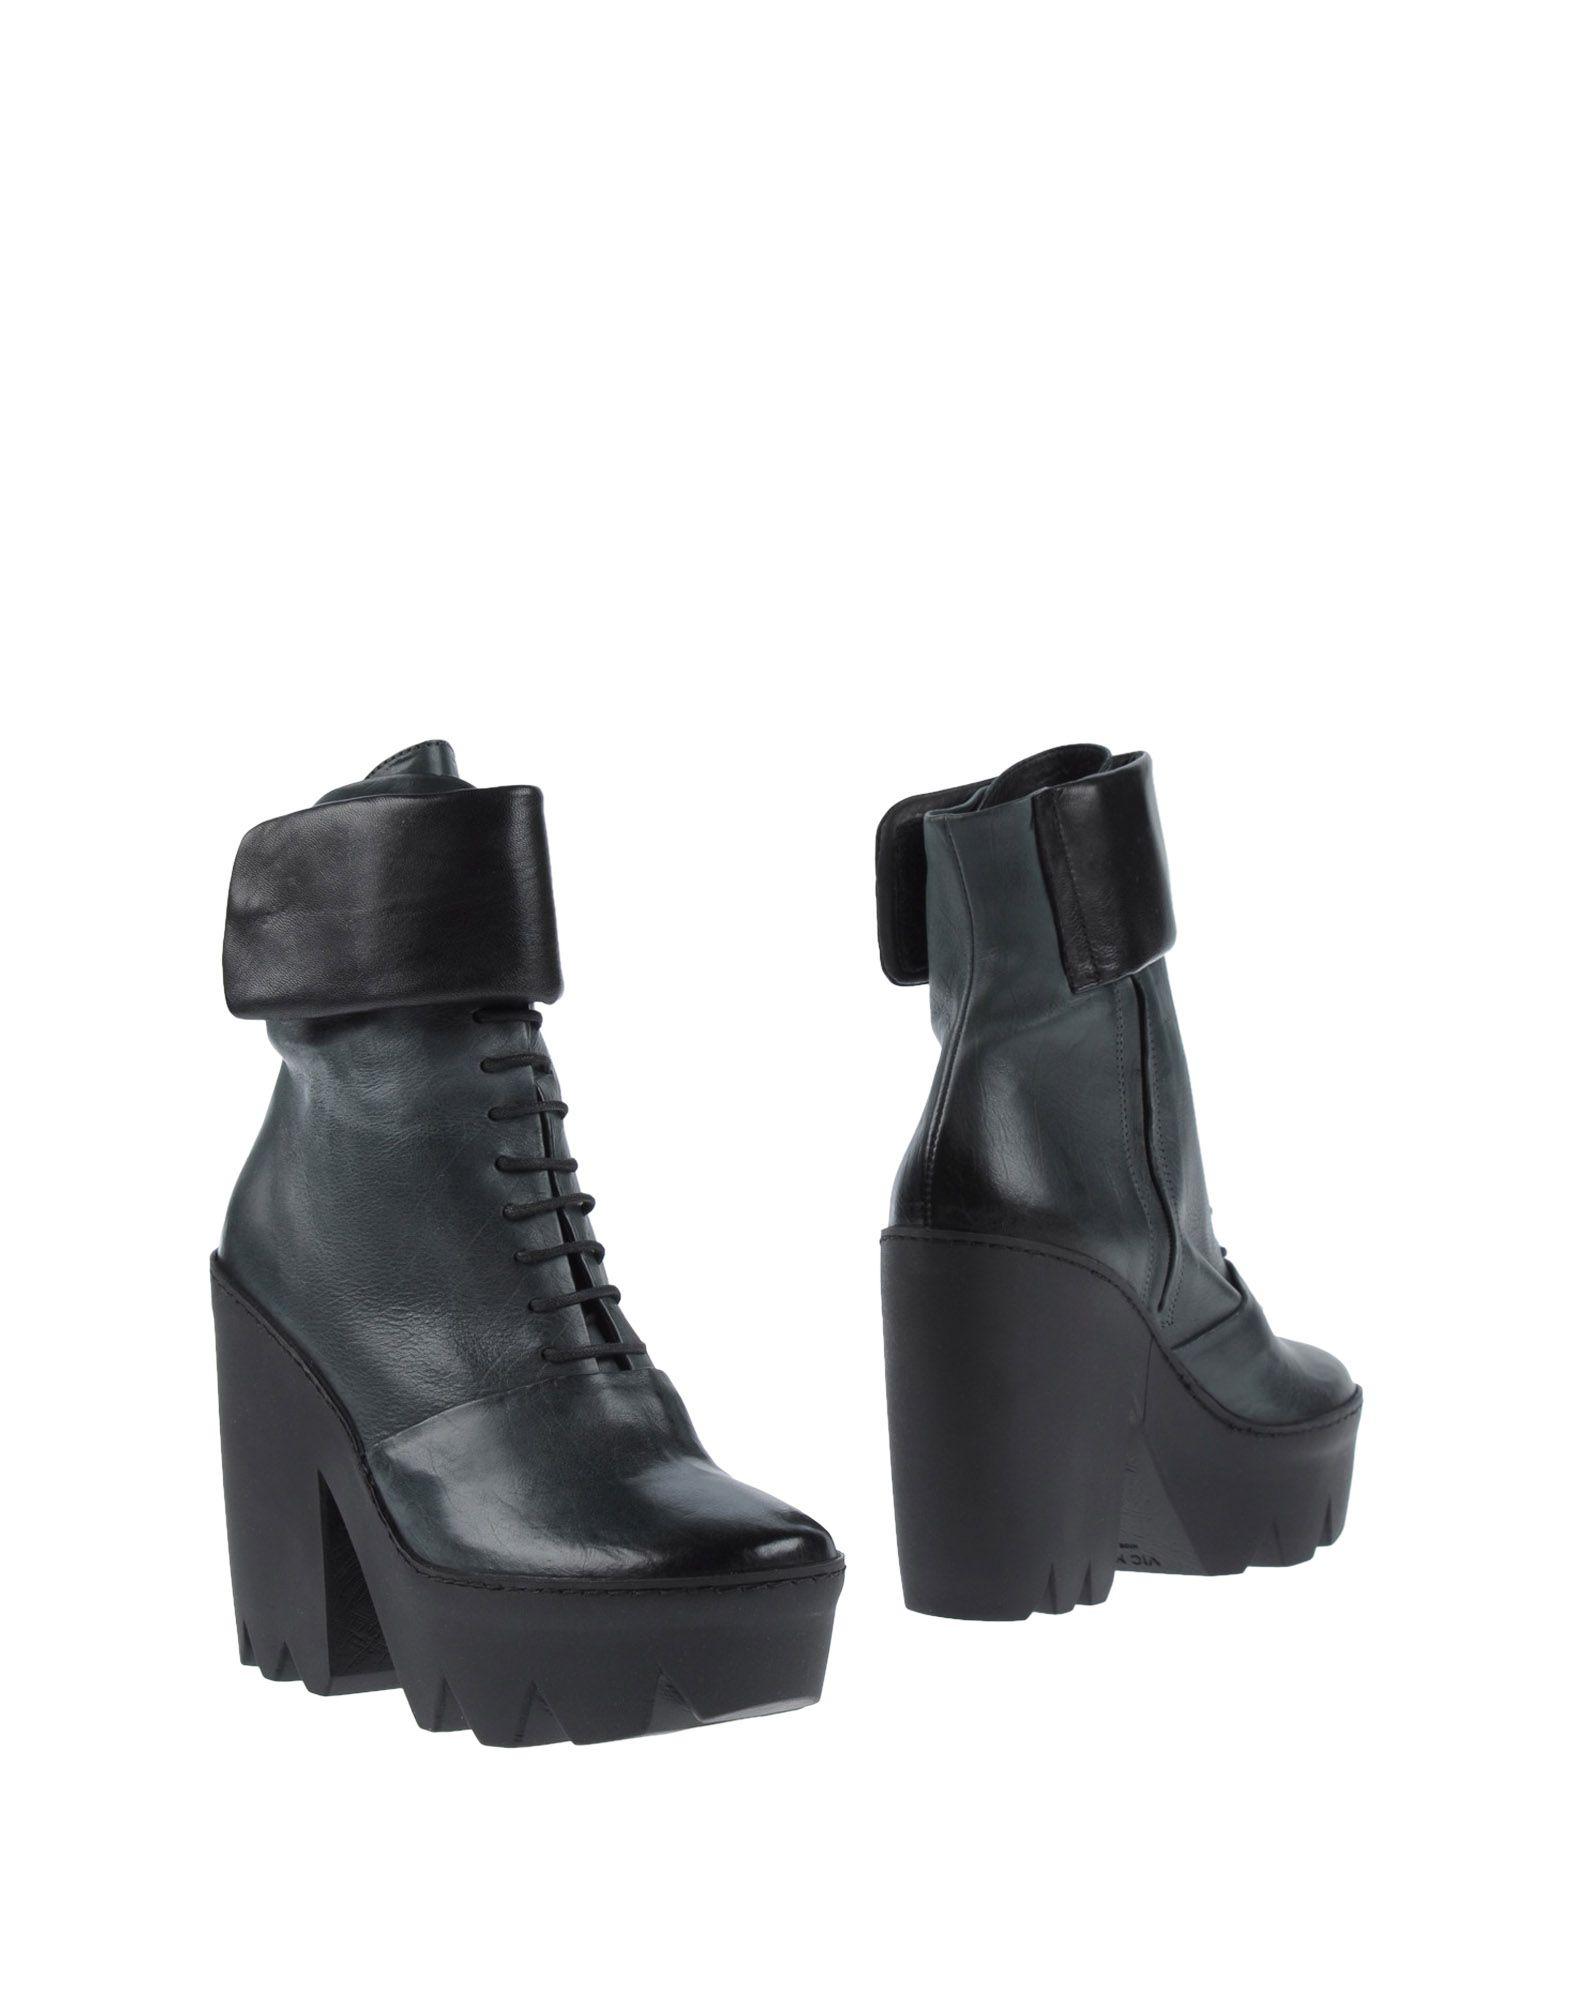 VIC MATIĒ Полусапоги и высокие ботинки vic matie стильные белые женские ботильоны итальянского бренда vic matie